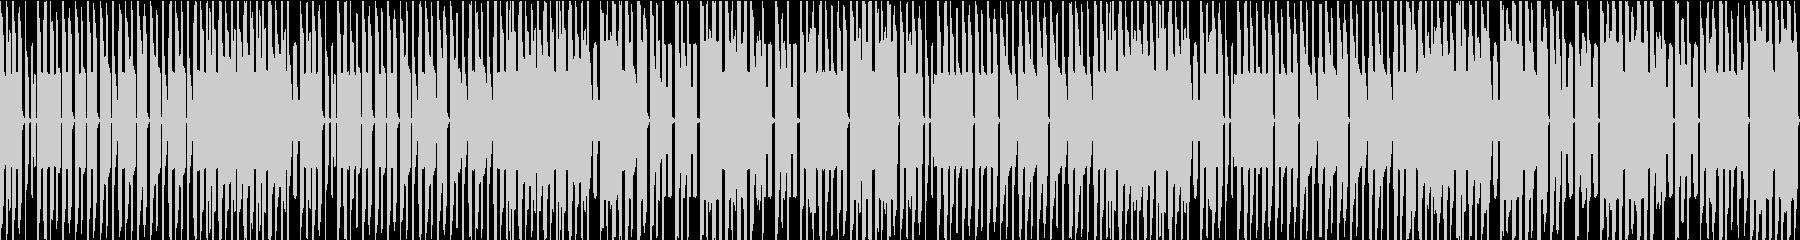 FC風ループ おかしな雰囲気の未再生の波形